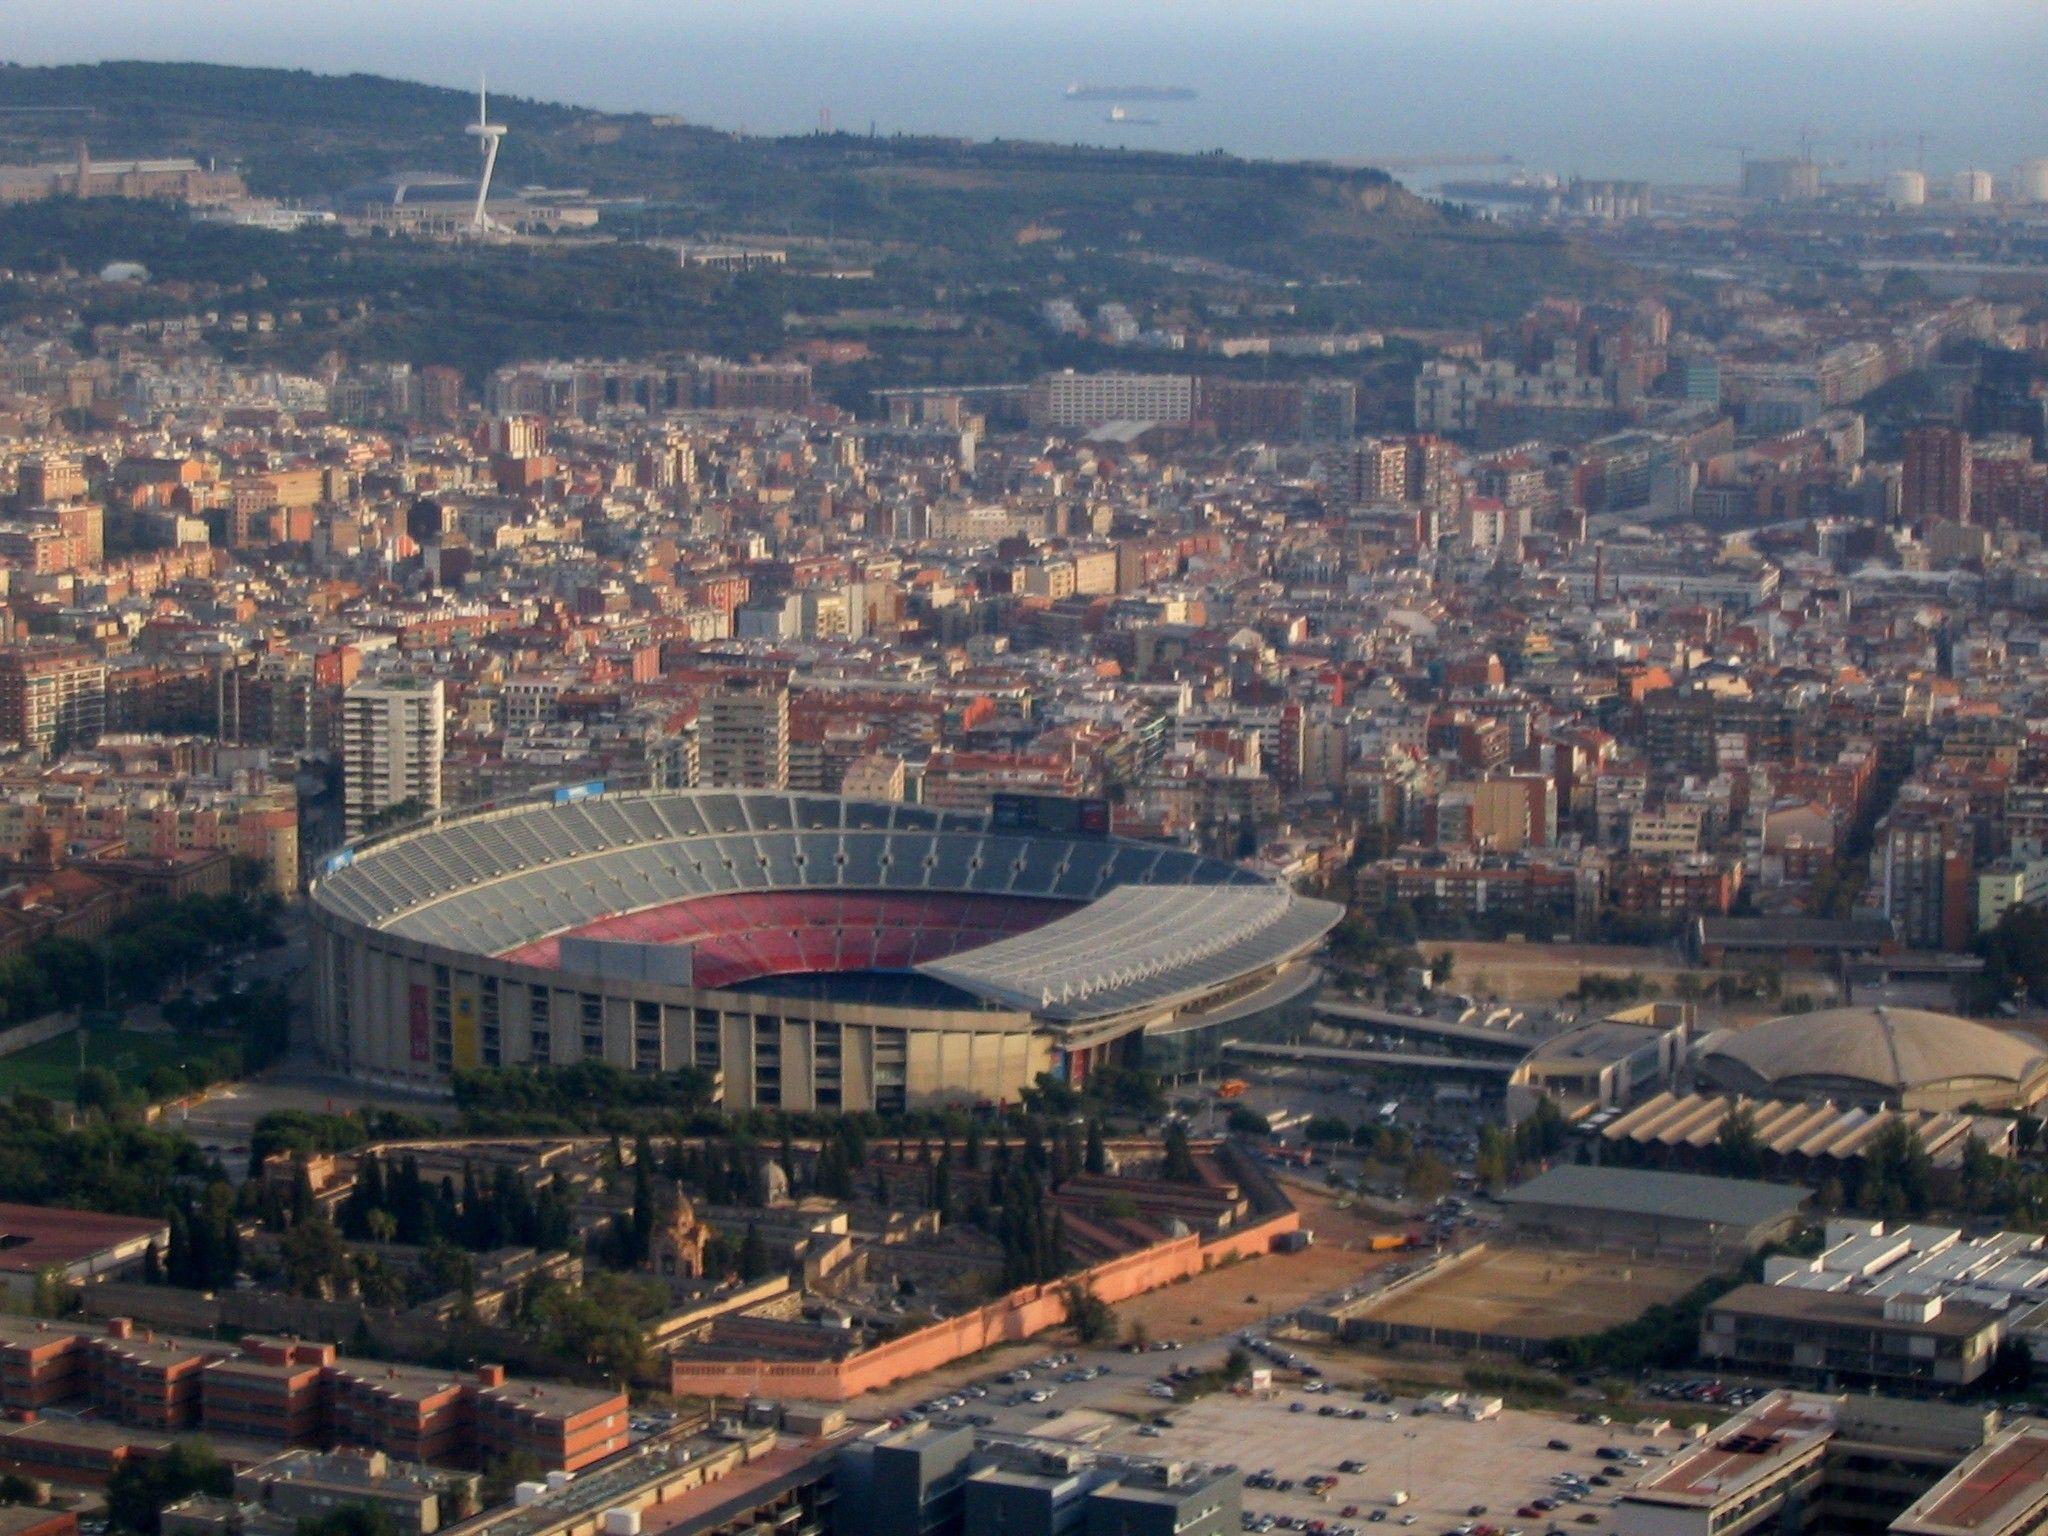 fc barcelona camp nou #bNu-